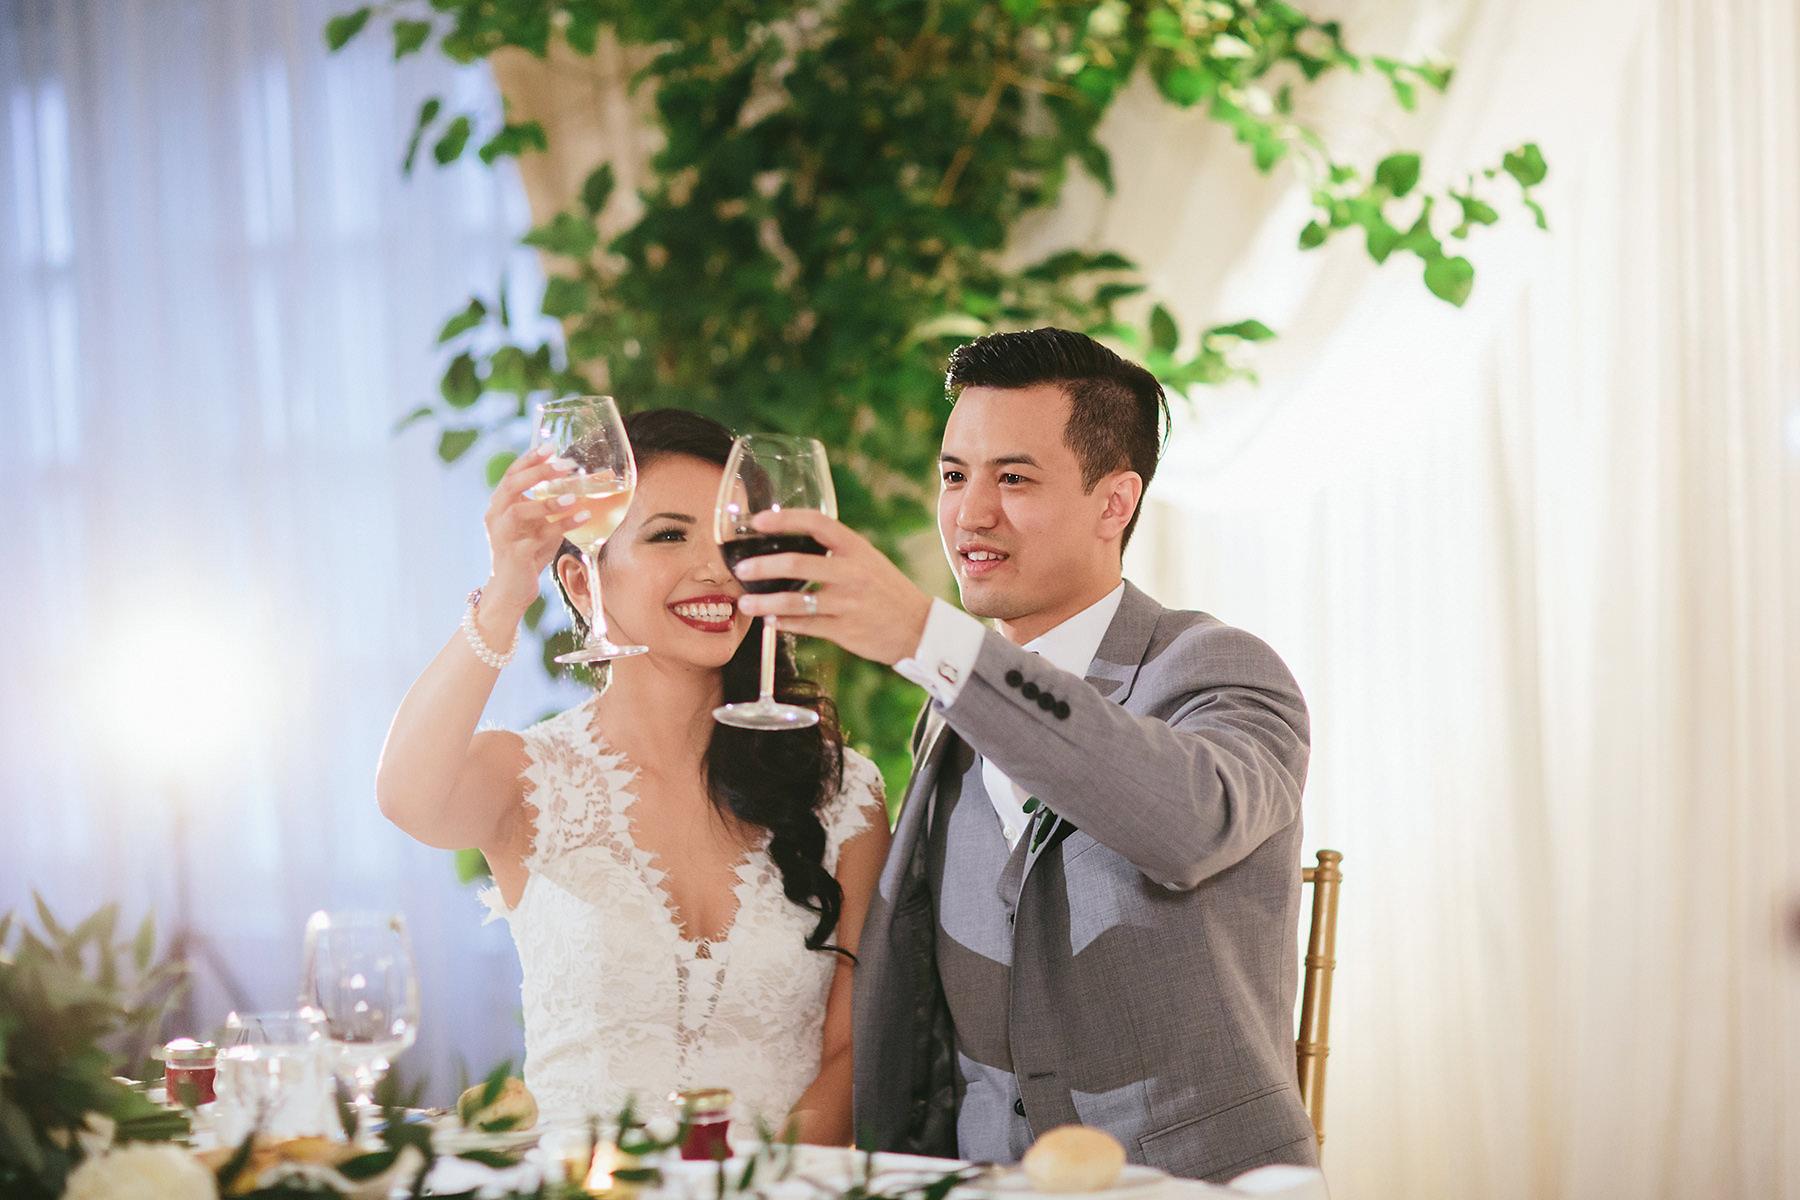 Vancouver Wedding Planning